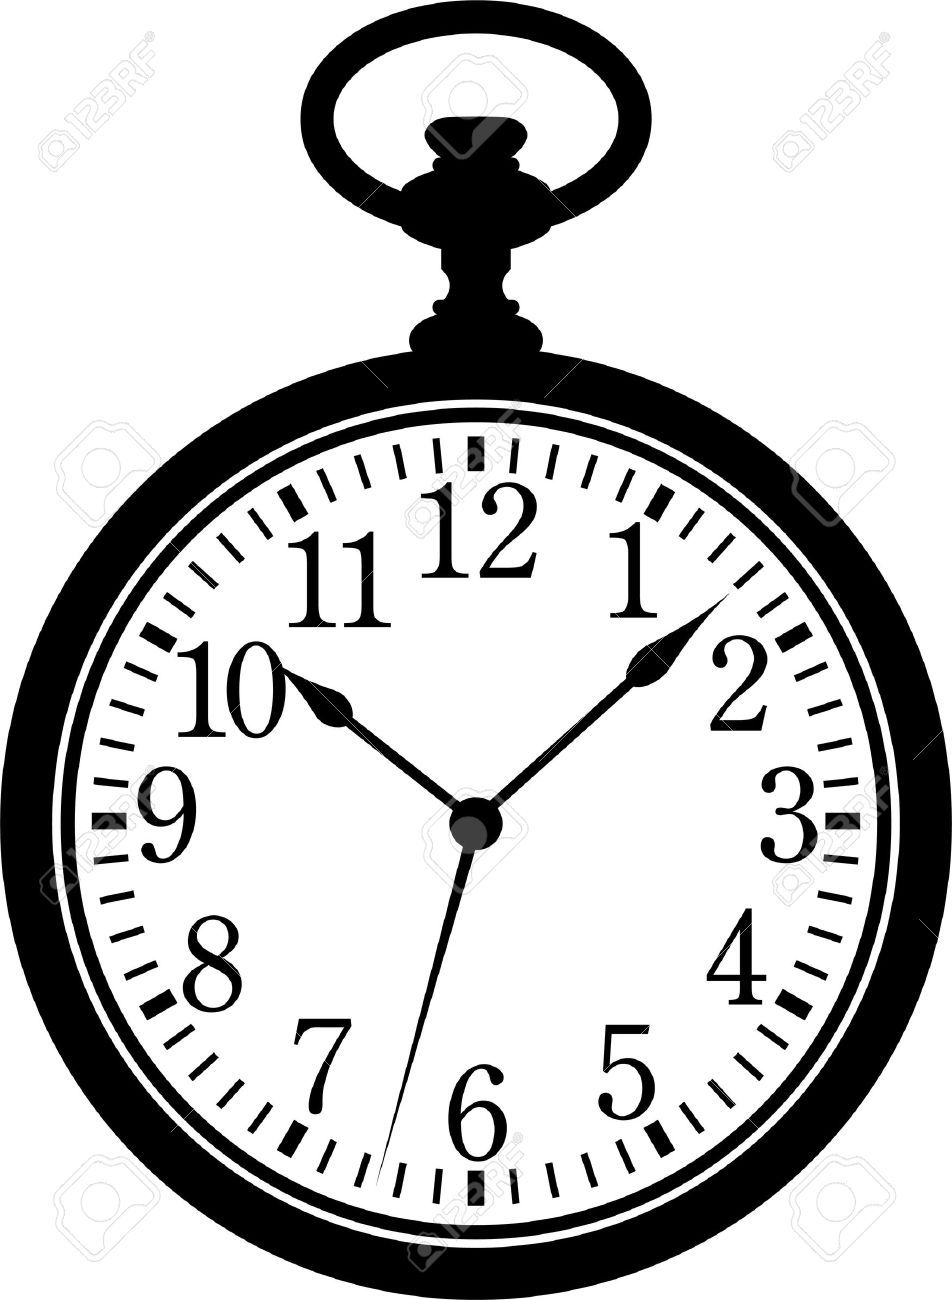 white rabbit clock template - Google Search | White Rabbit ...